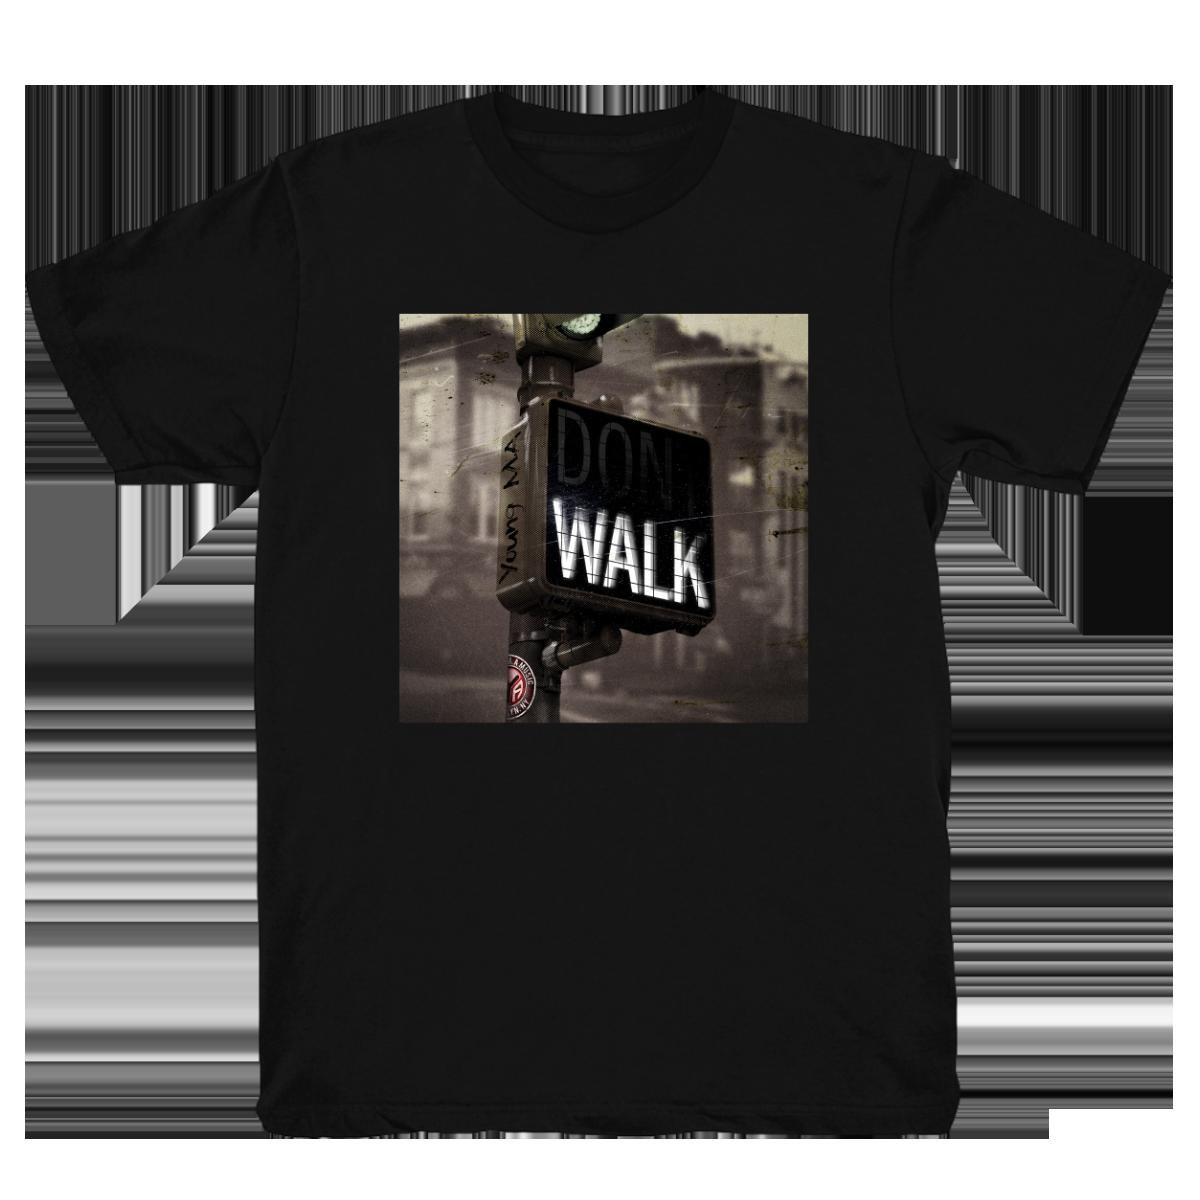 Walk T-Shirt [Black]